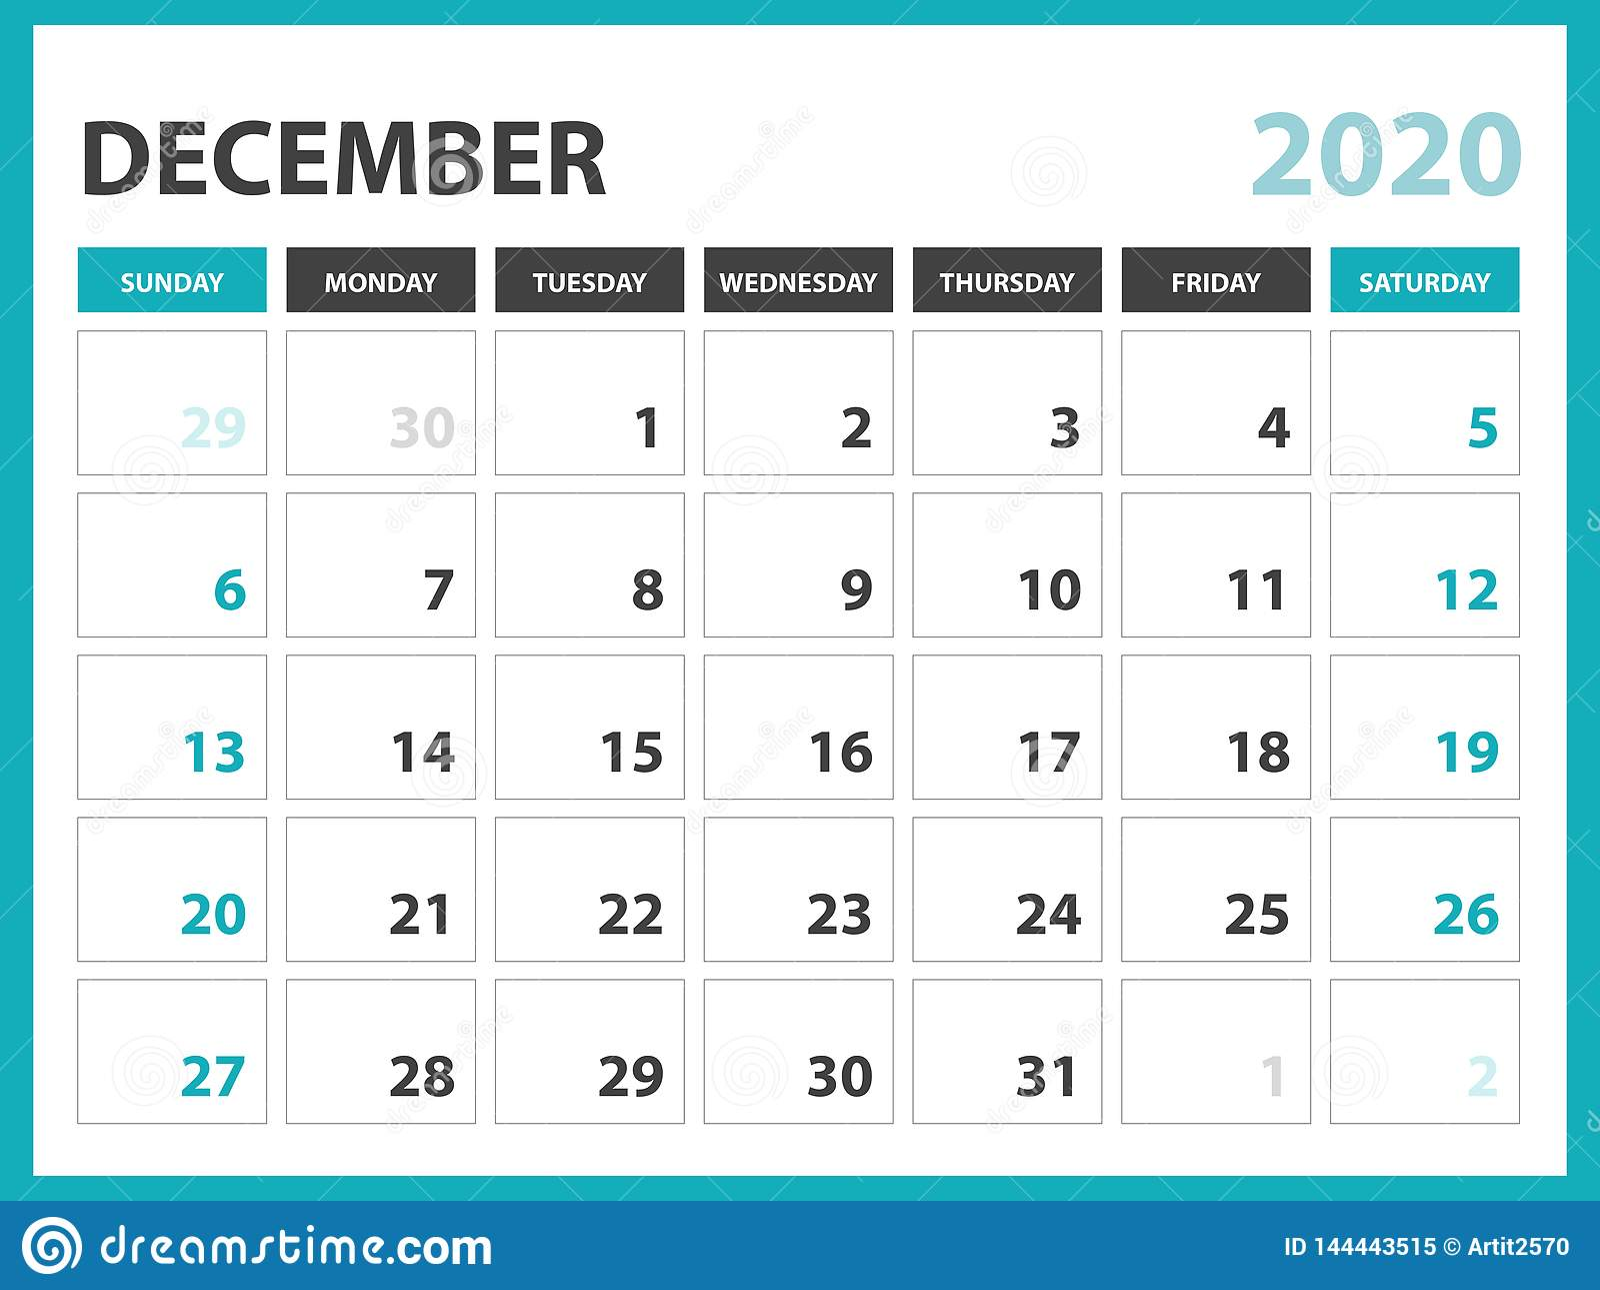 December Calendar 2020.Desk Calendar Layout Size 8 X 6 Inch December 2020 Calendar